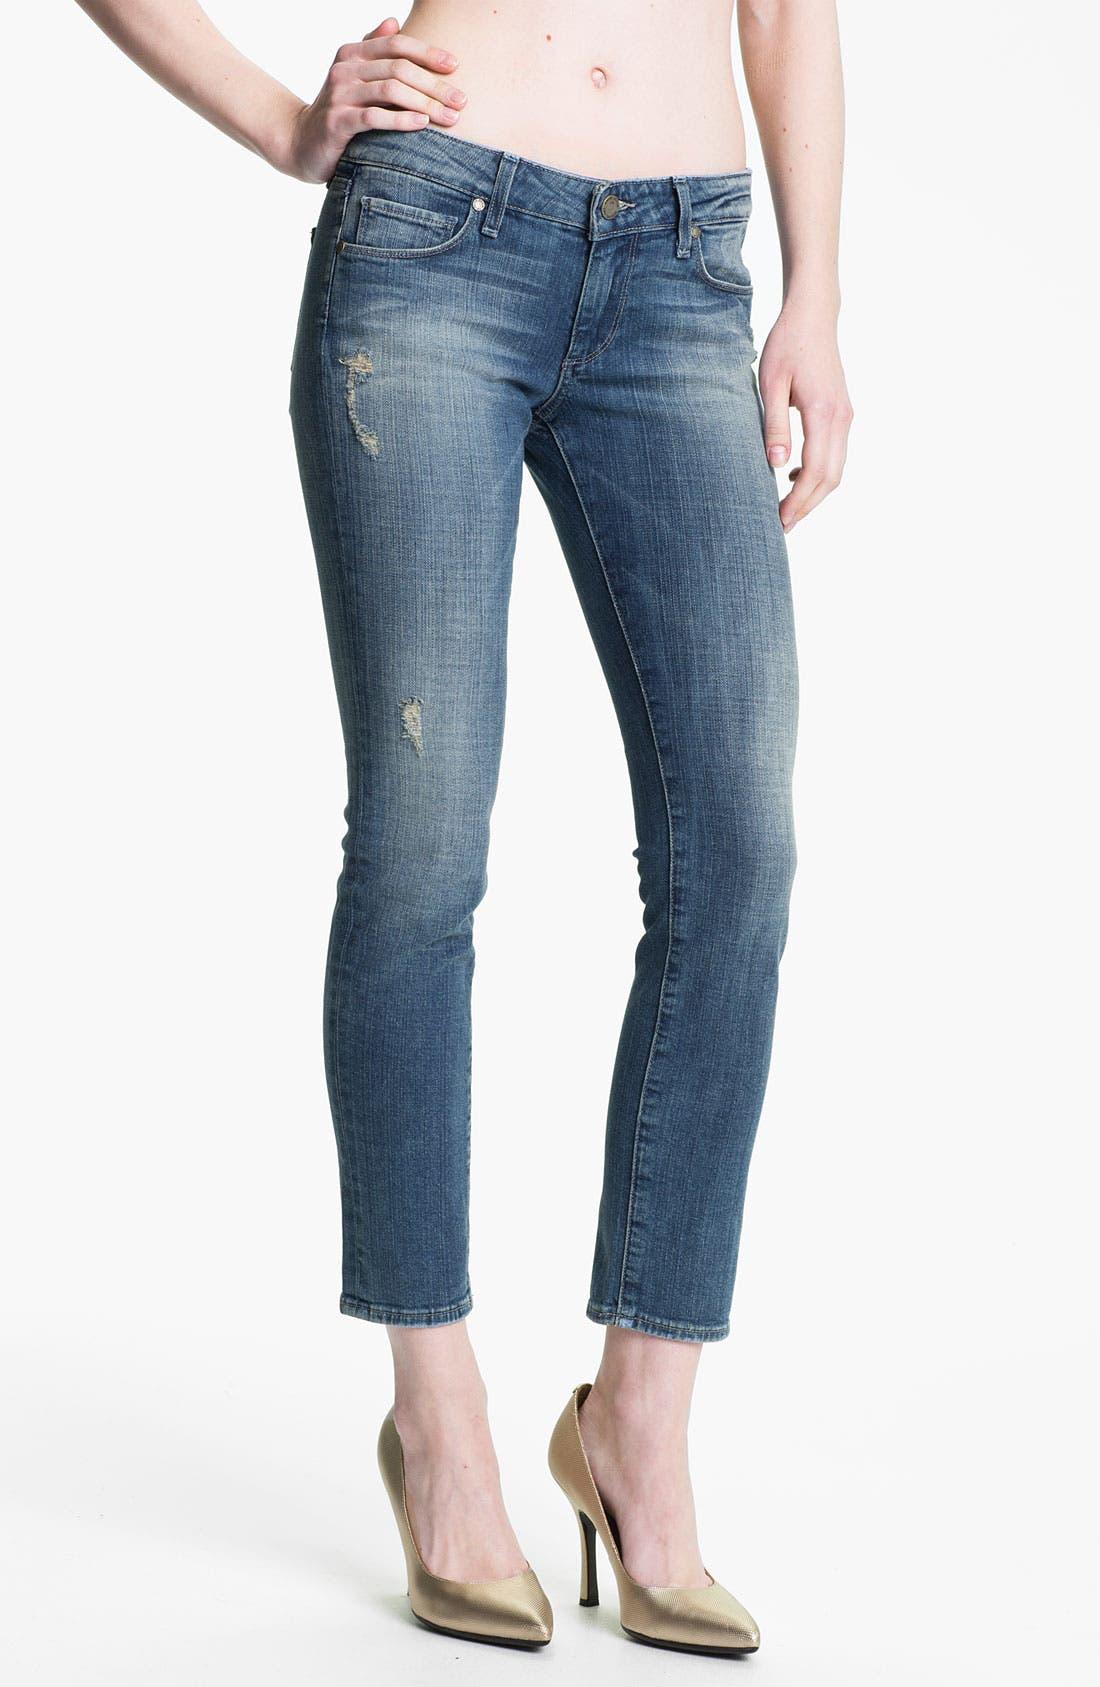 Main Image - Paige Denim 'Skyline' Ankle Peg Skinny Stretch Jeans (Sadie)